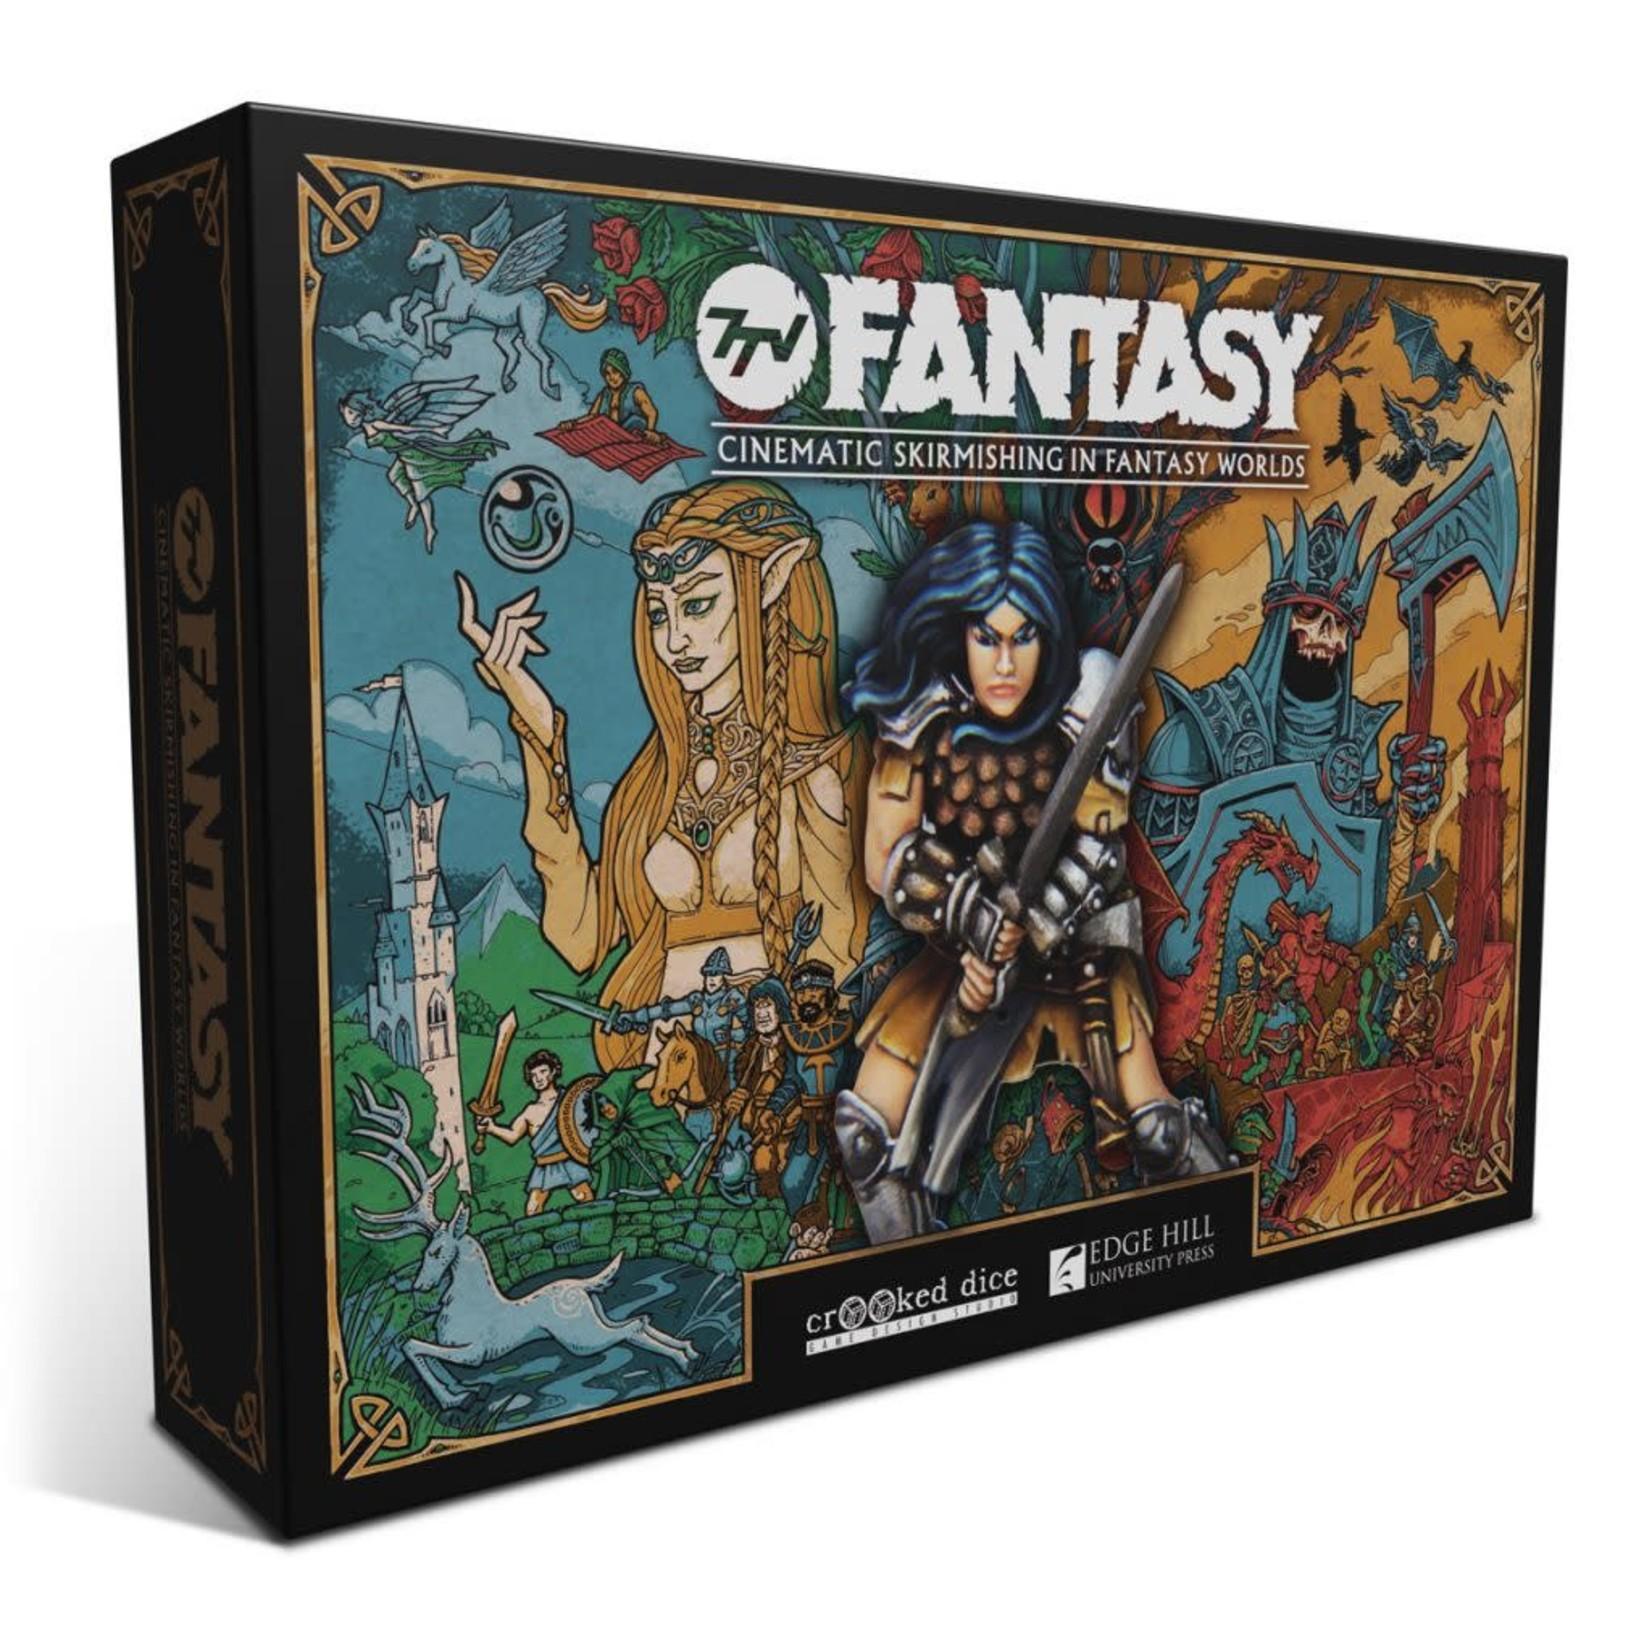 7TV Fantasy Boxed Game